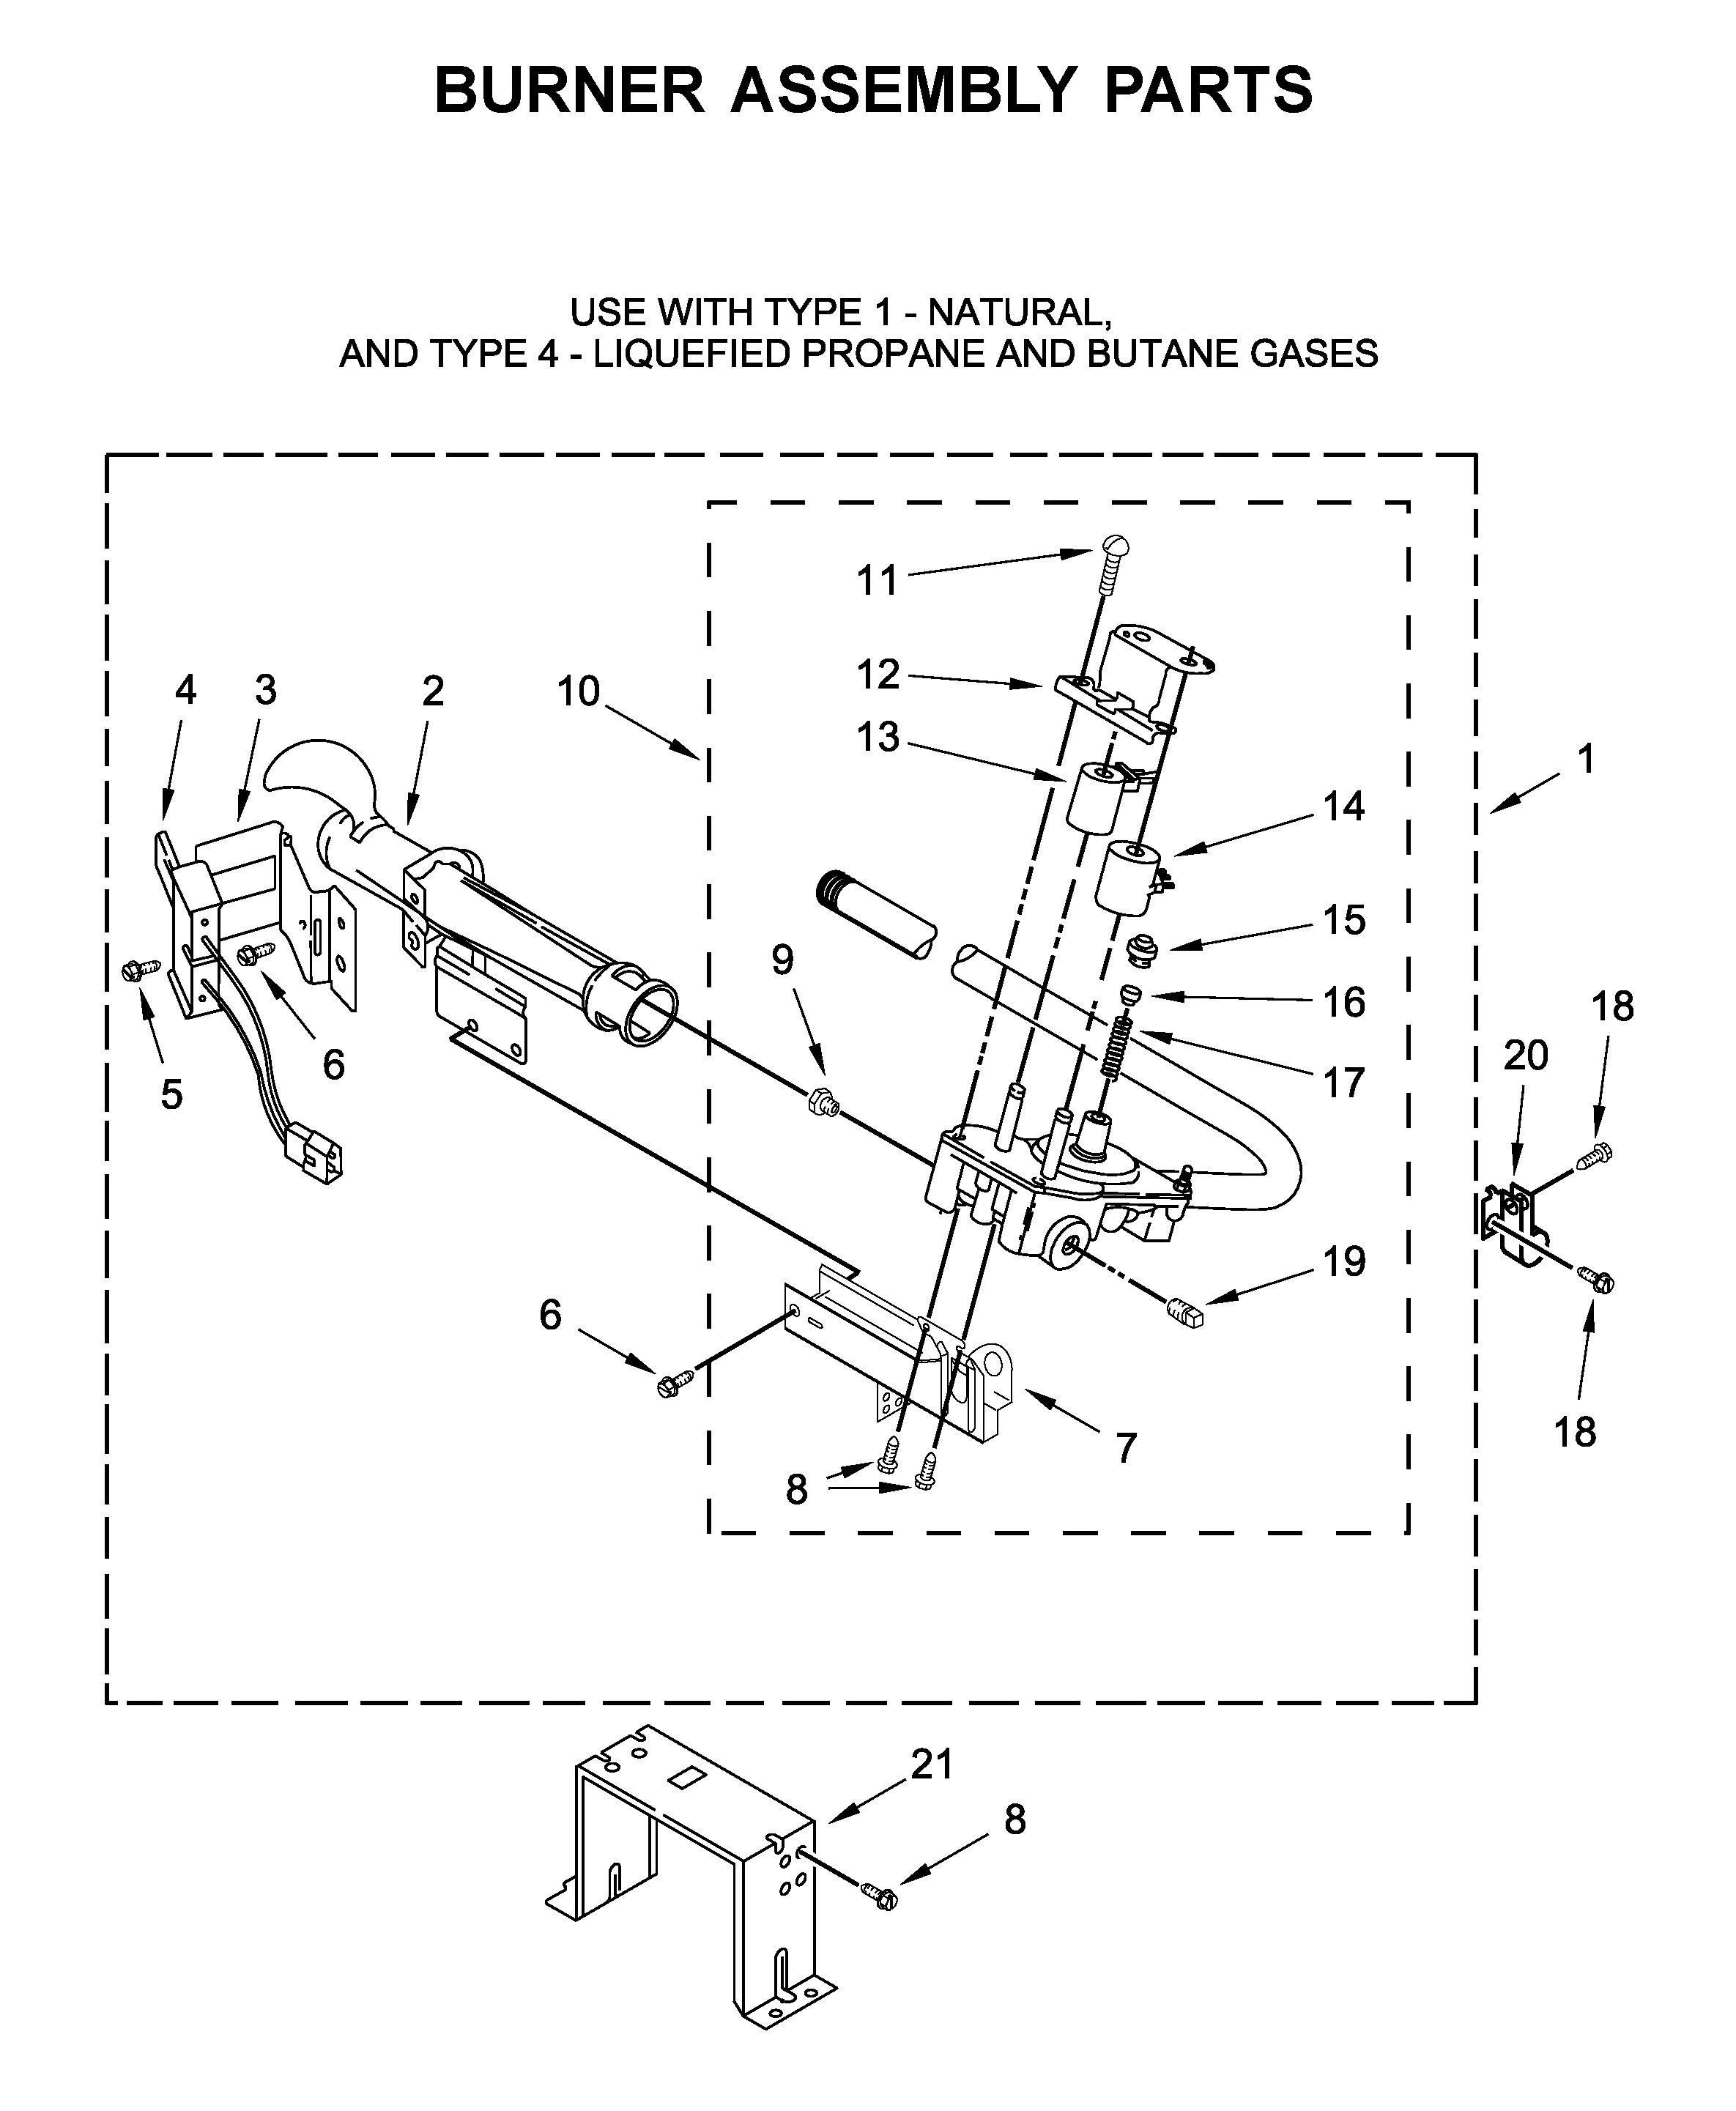 Maytag  Dryer  Burner assembly parts